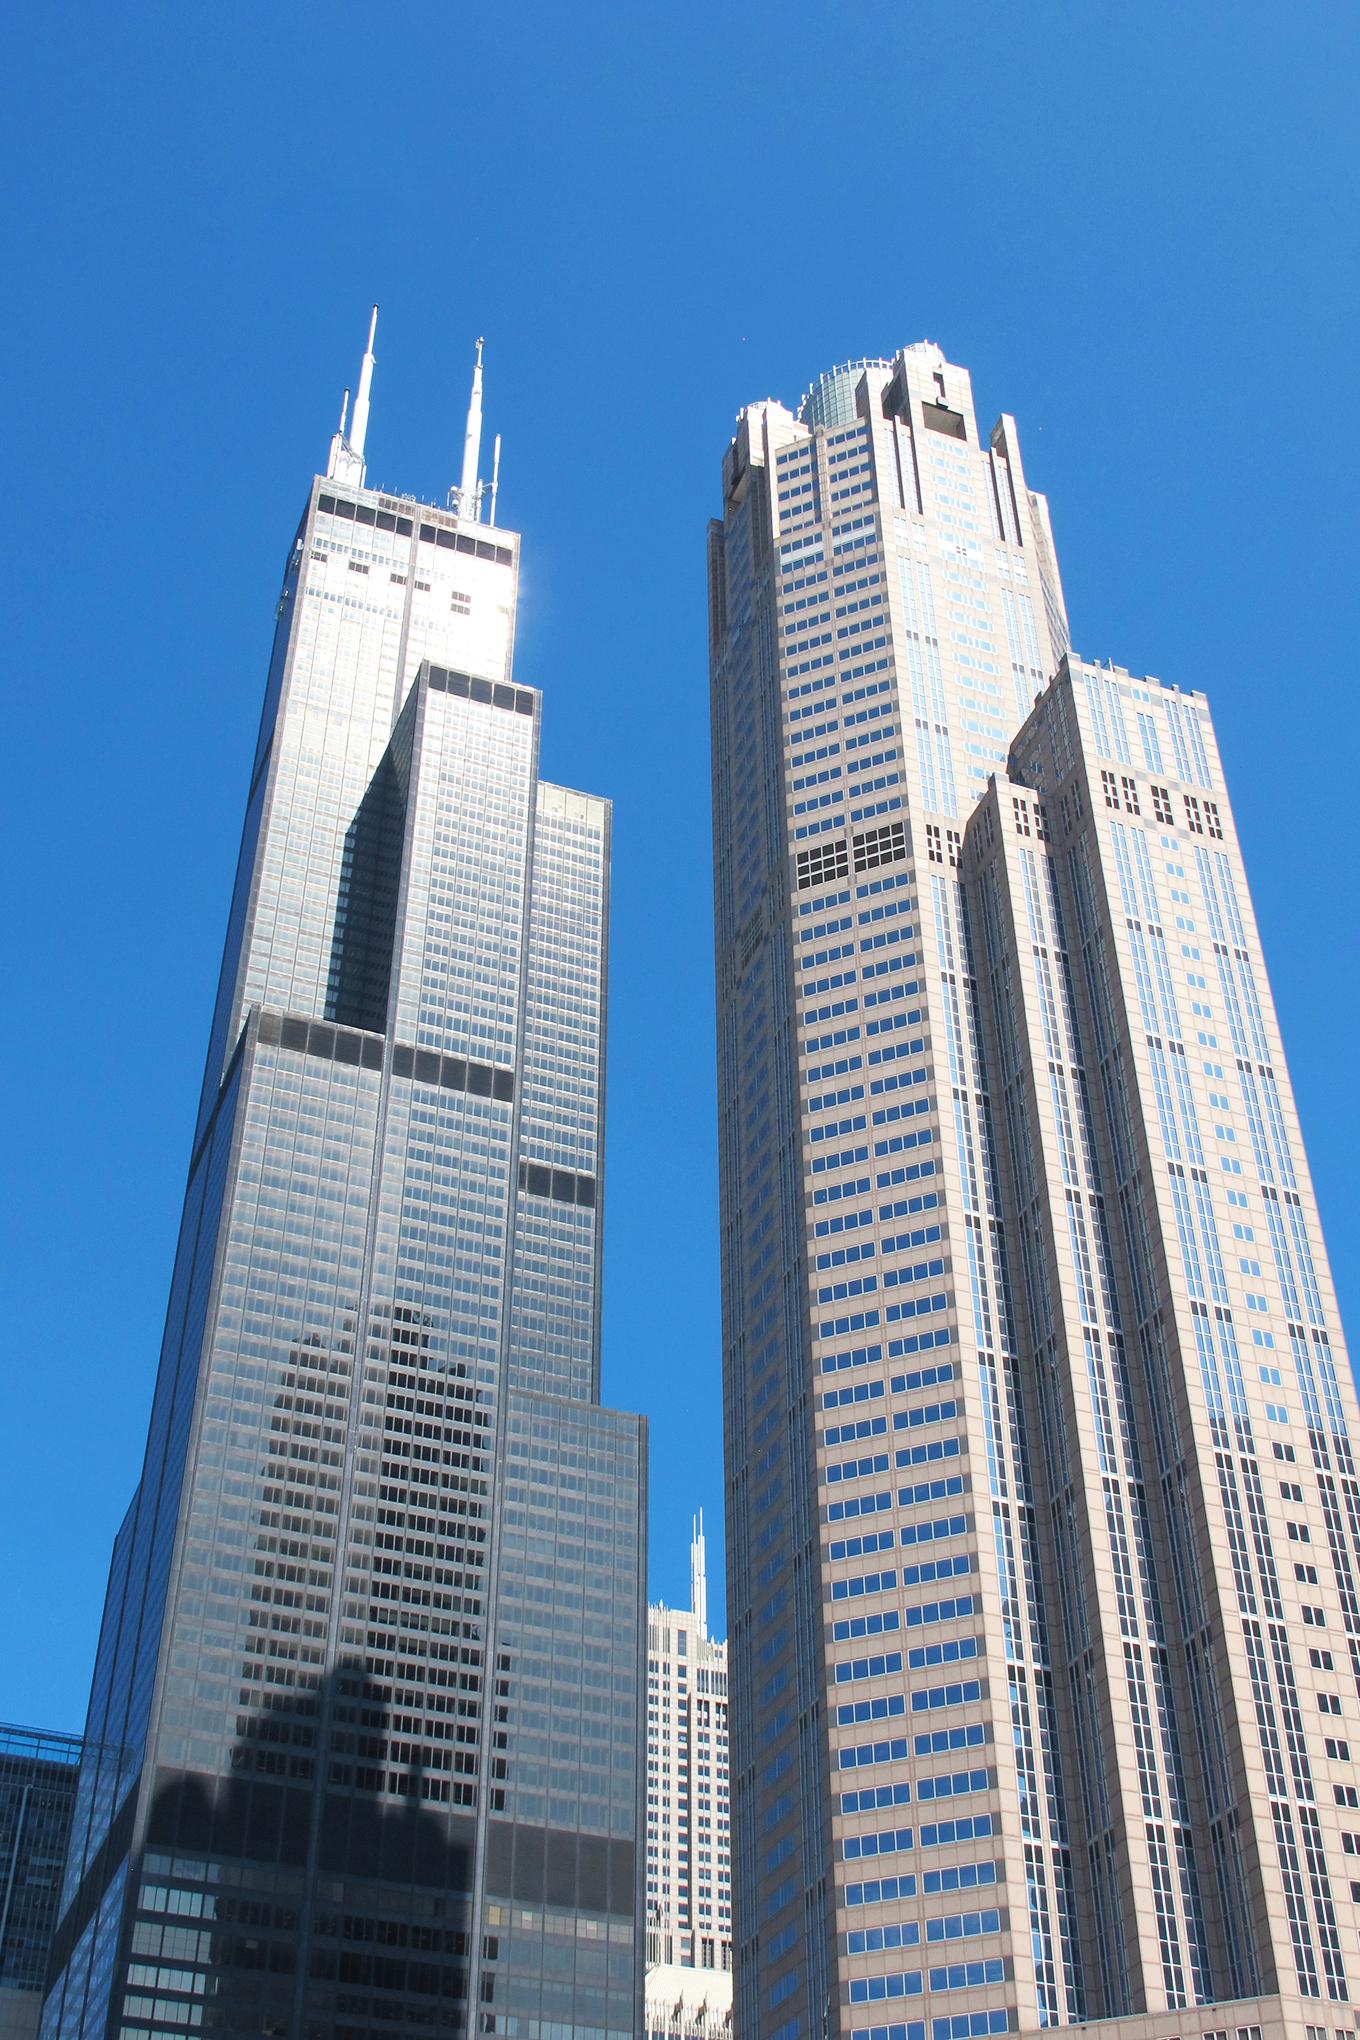 Left: The Willis (Sears) Tower, 1973, Architect: SOM; Right: 311 South Wacker, 1990 Architect Kohn, Pederson Fox